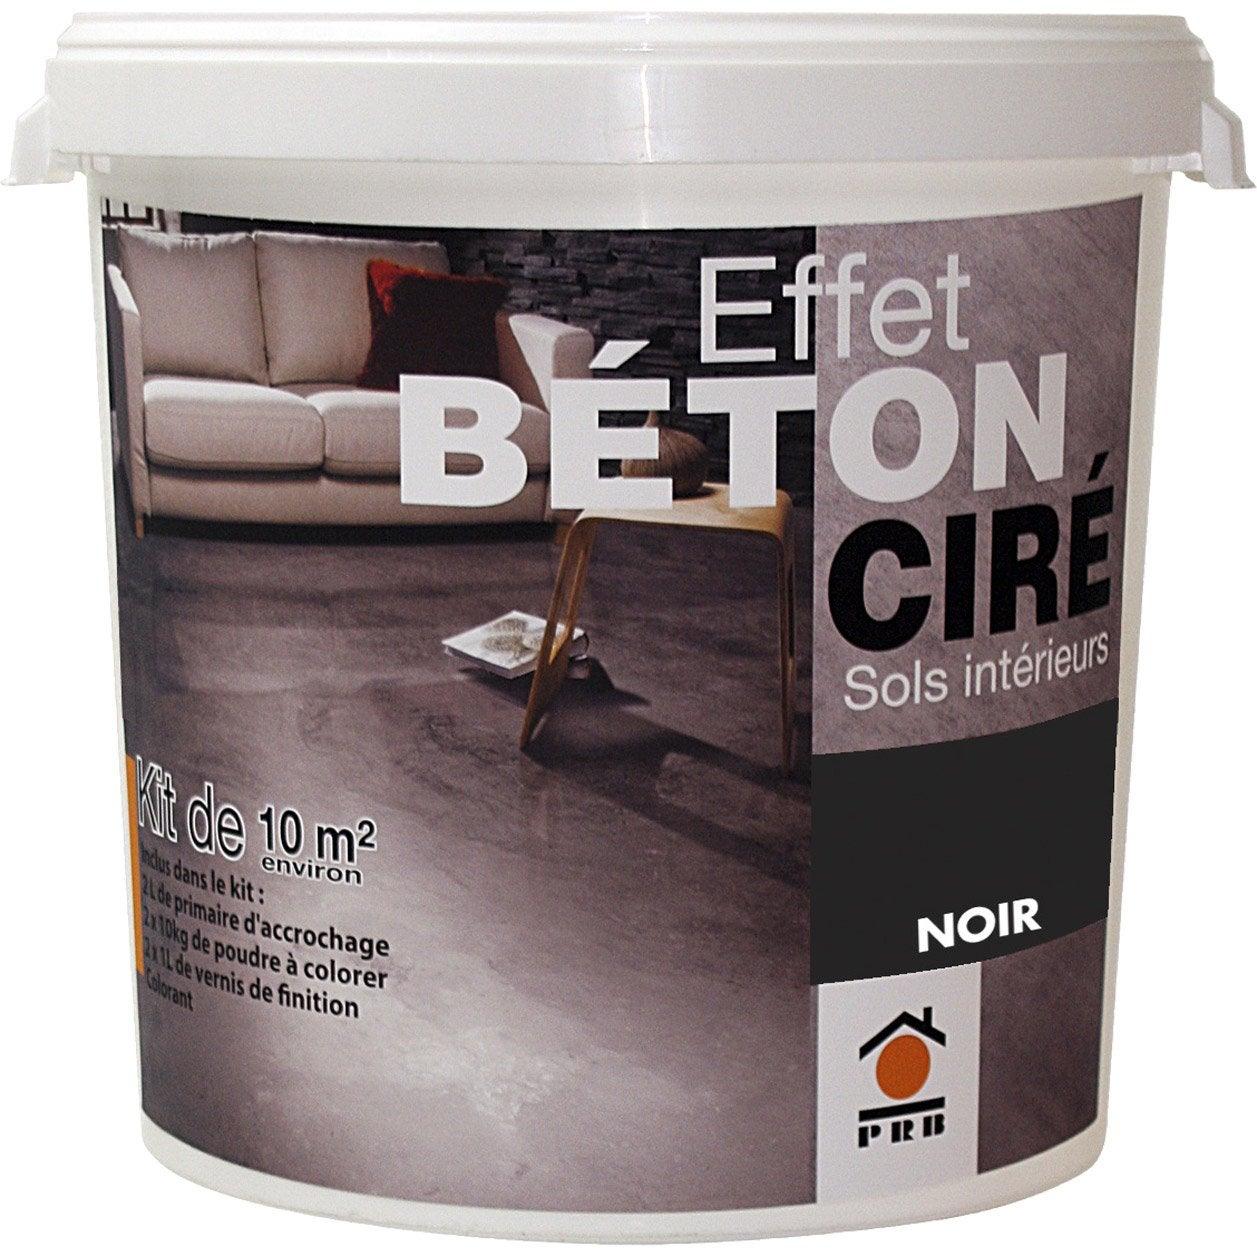 Béton à effet ciré gris smoke PRB, 10m² | Leroy Merlin